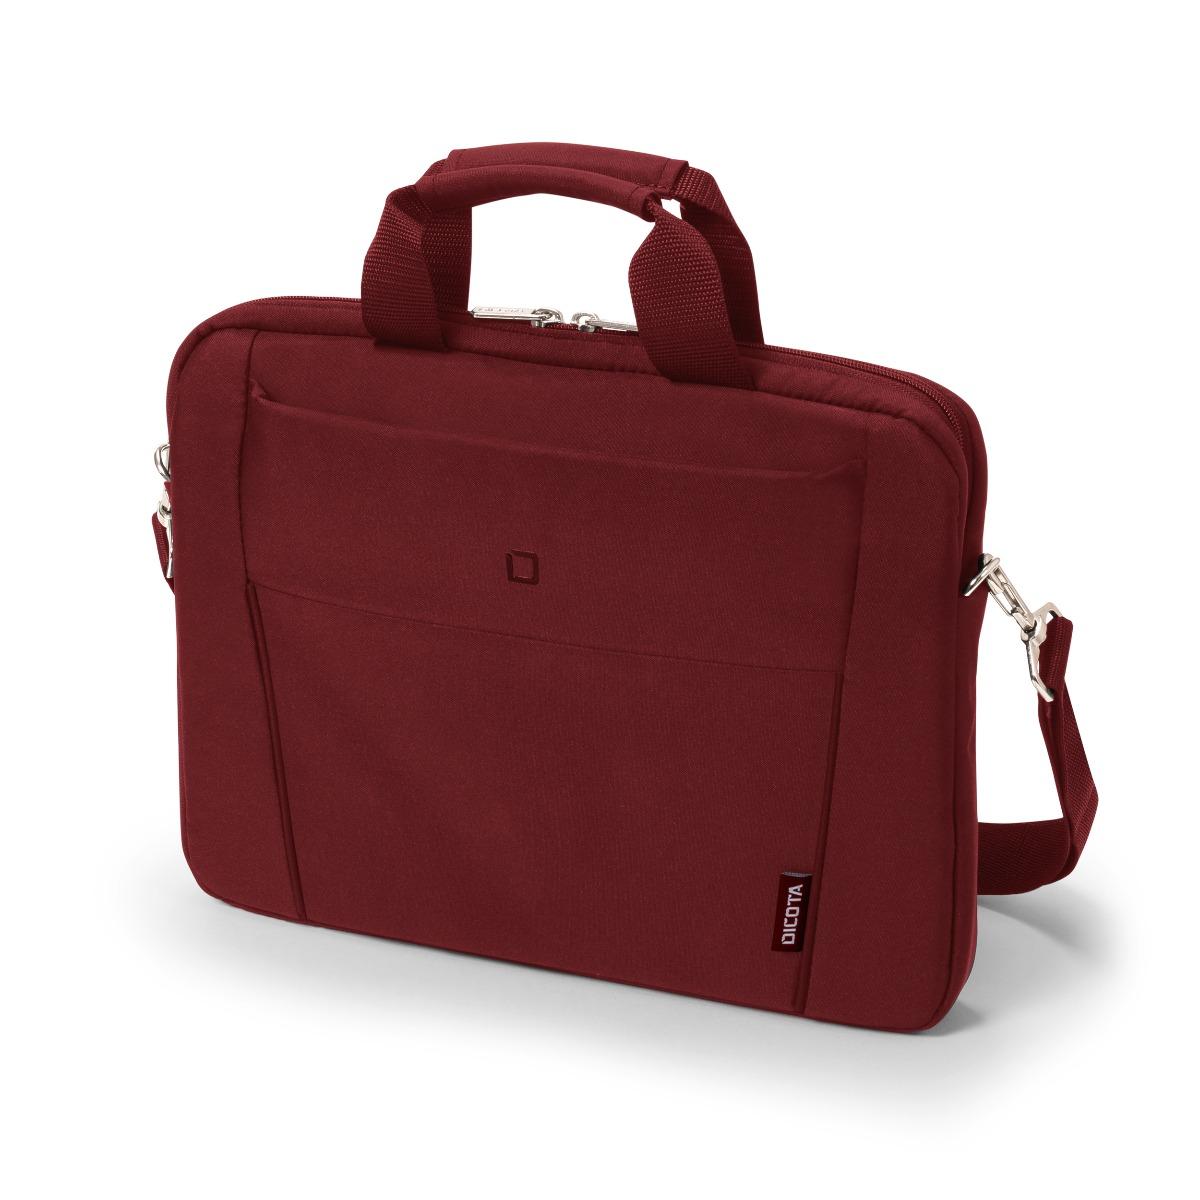 Dicota Slim Case BASE 11-12.5 red - D31302